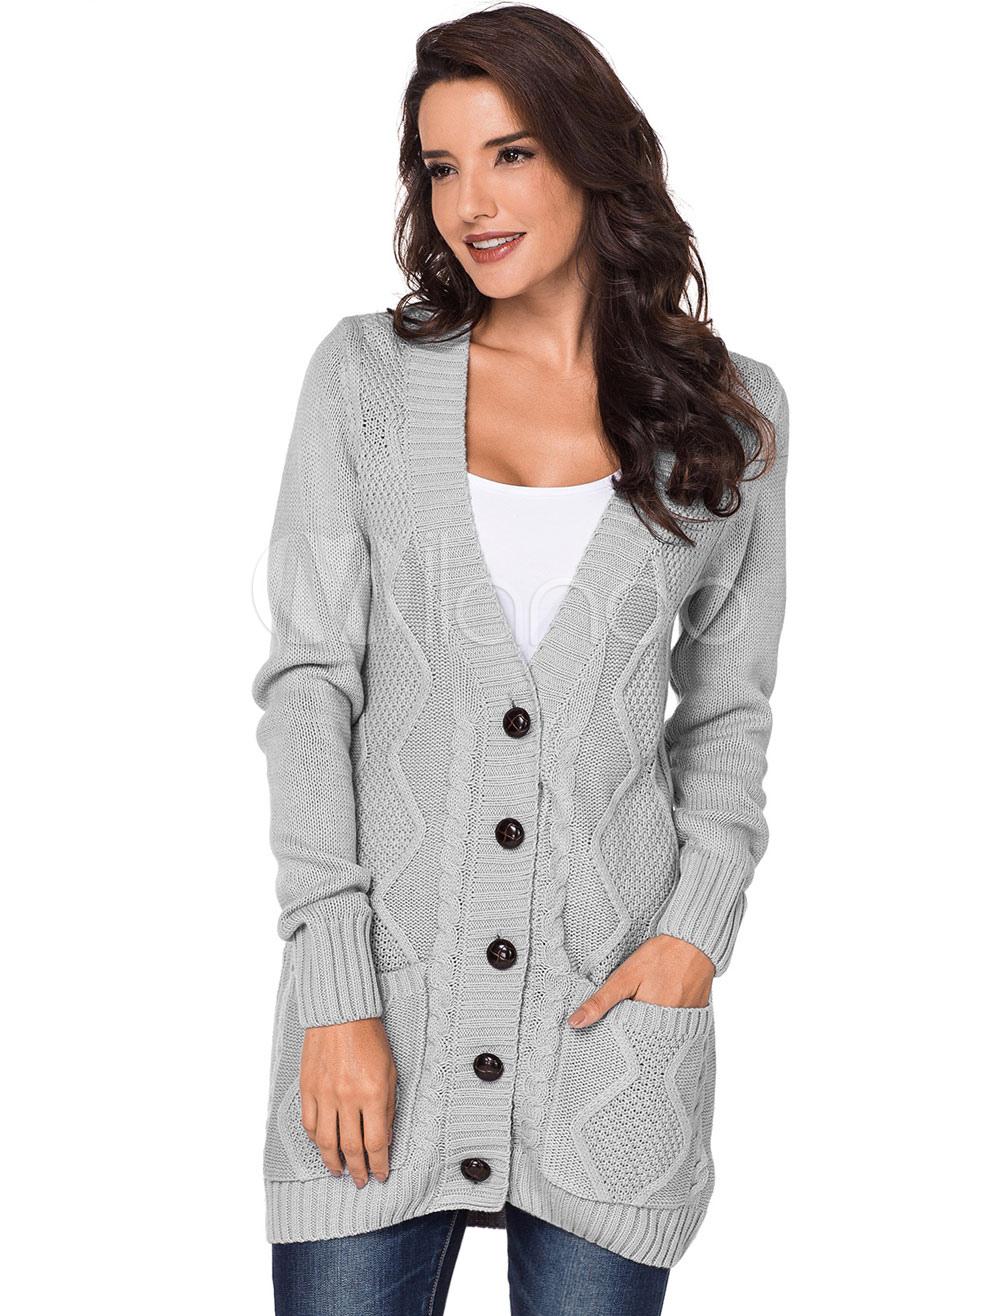 4b644984de Suéter Cardigan Mujer bolsillos de botones de manga larga gris prendas de vestir  exteriores-No ...